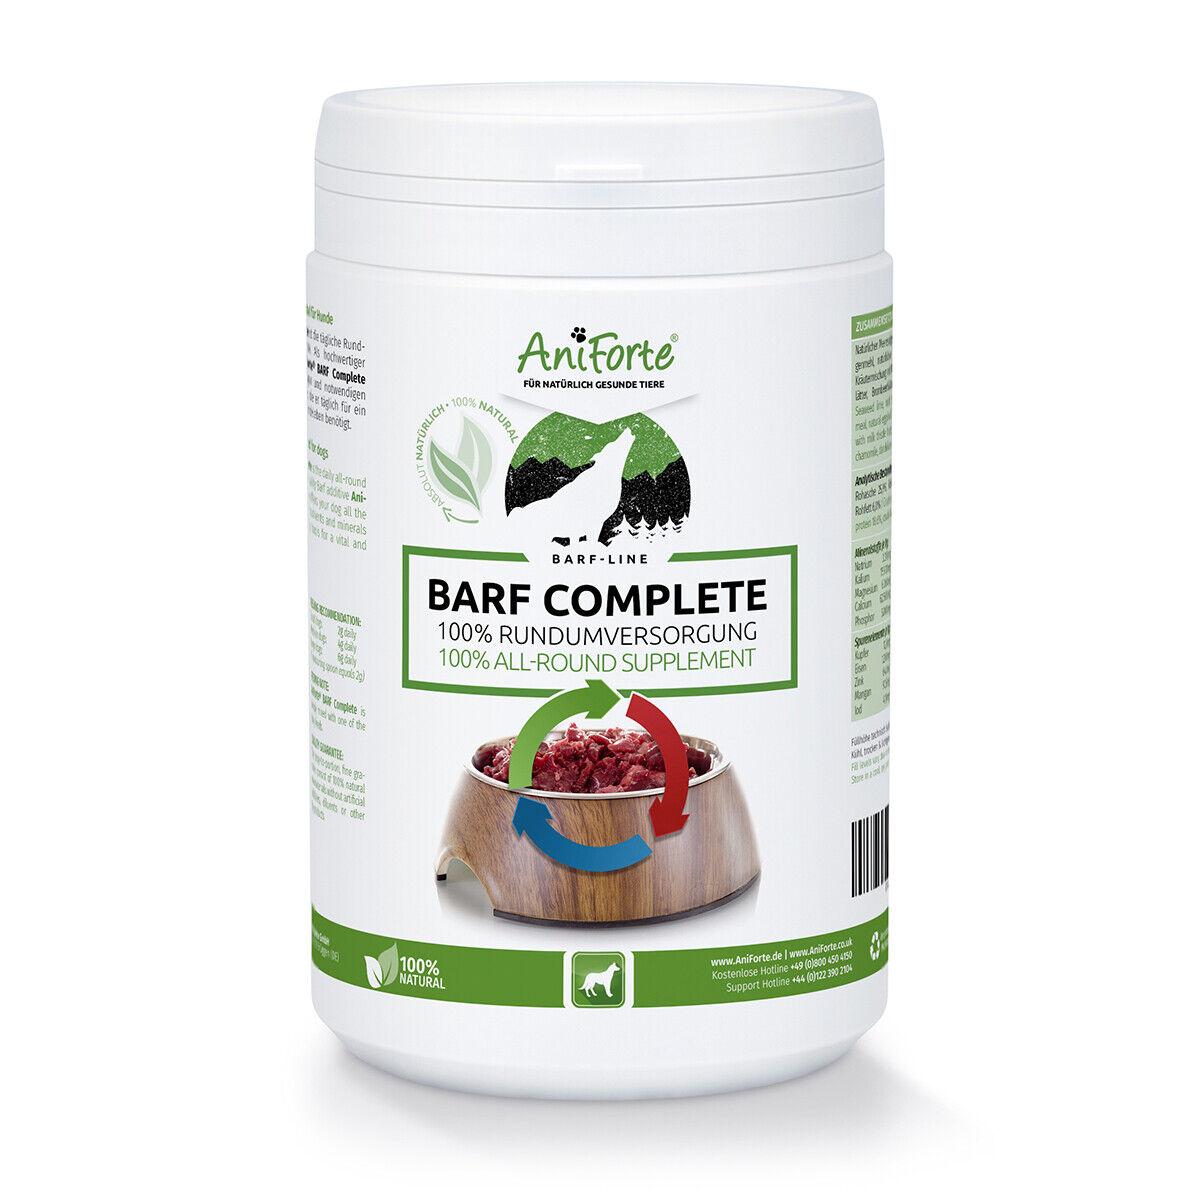 AniForte® BARF Complete Hundefutter Ergänzungsfuttermittel Zusatzfutter Hund